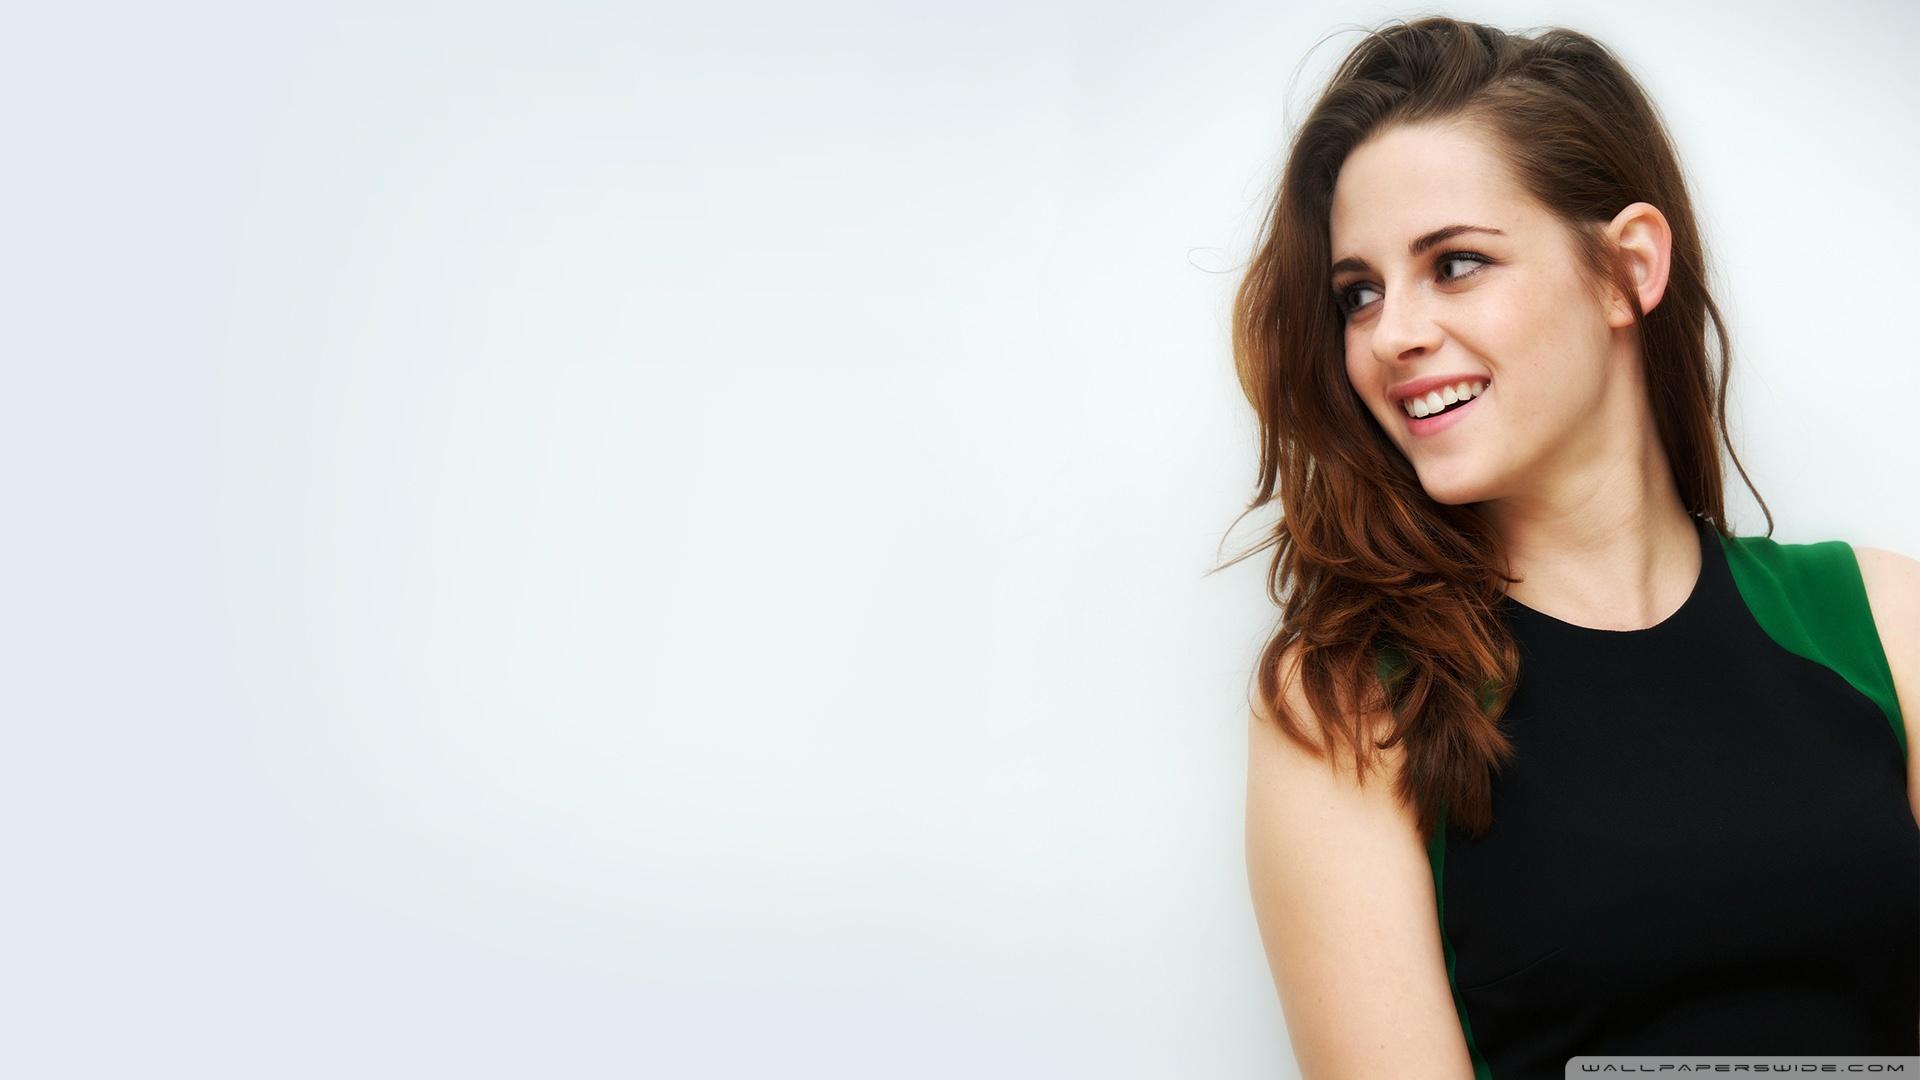 WallpapersWide com | Kristen Stewart HD Desktop Wallpapers for